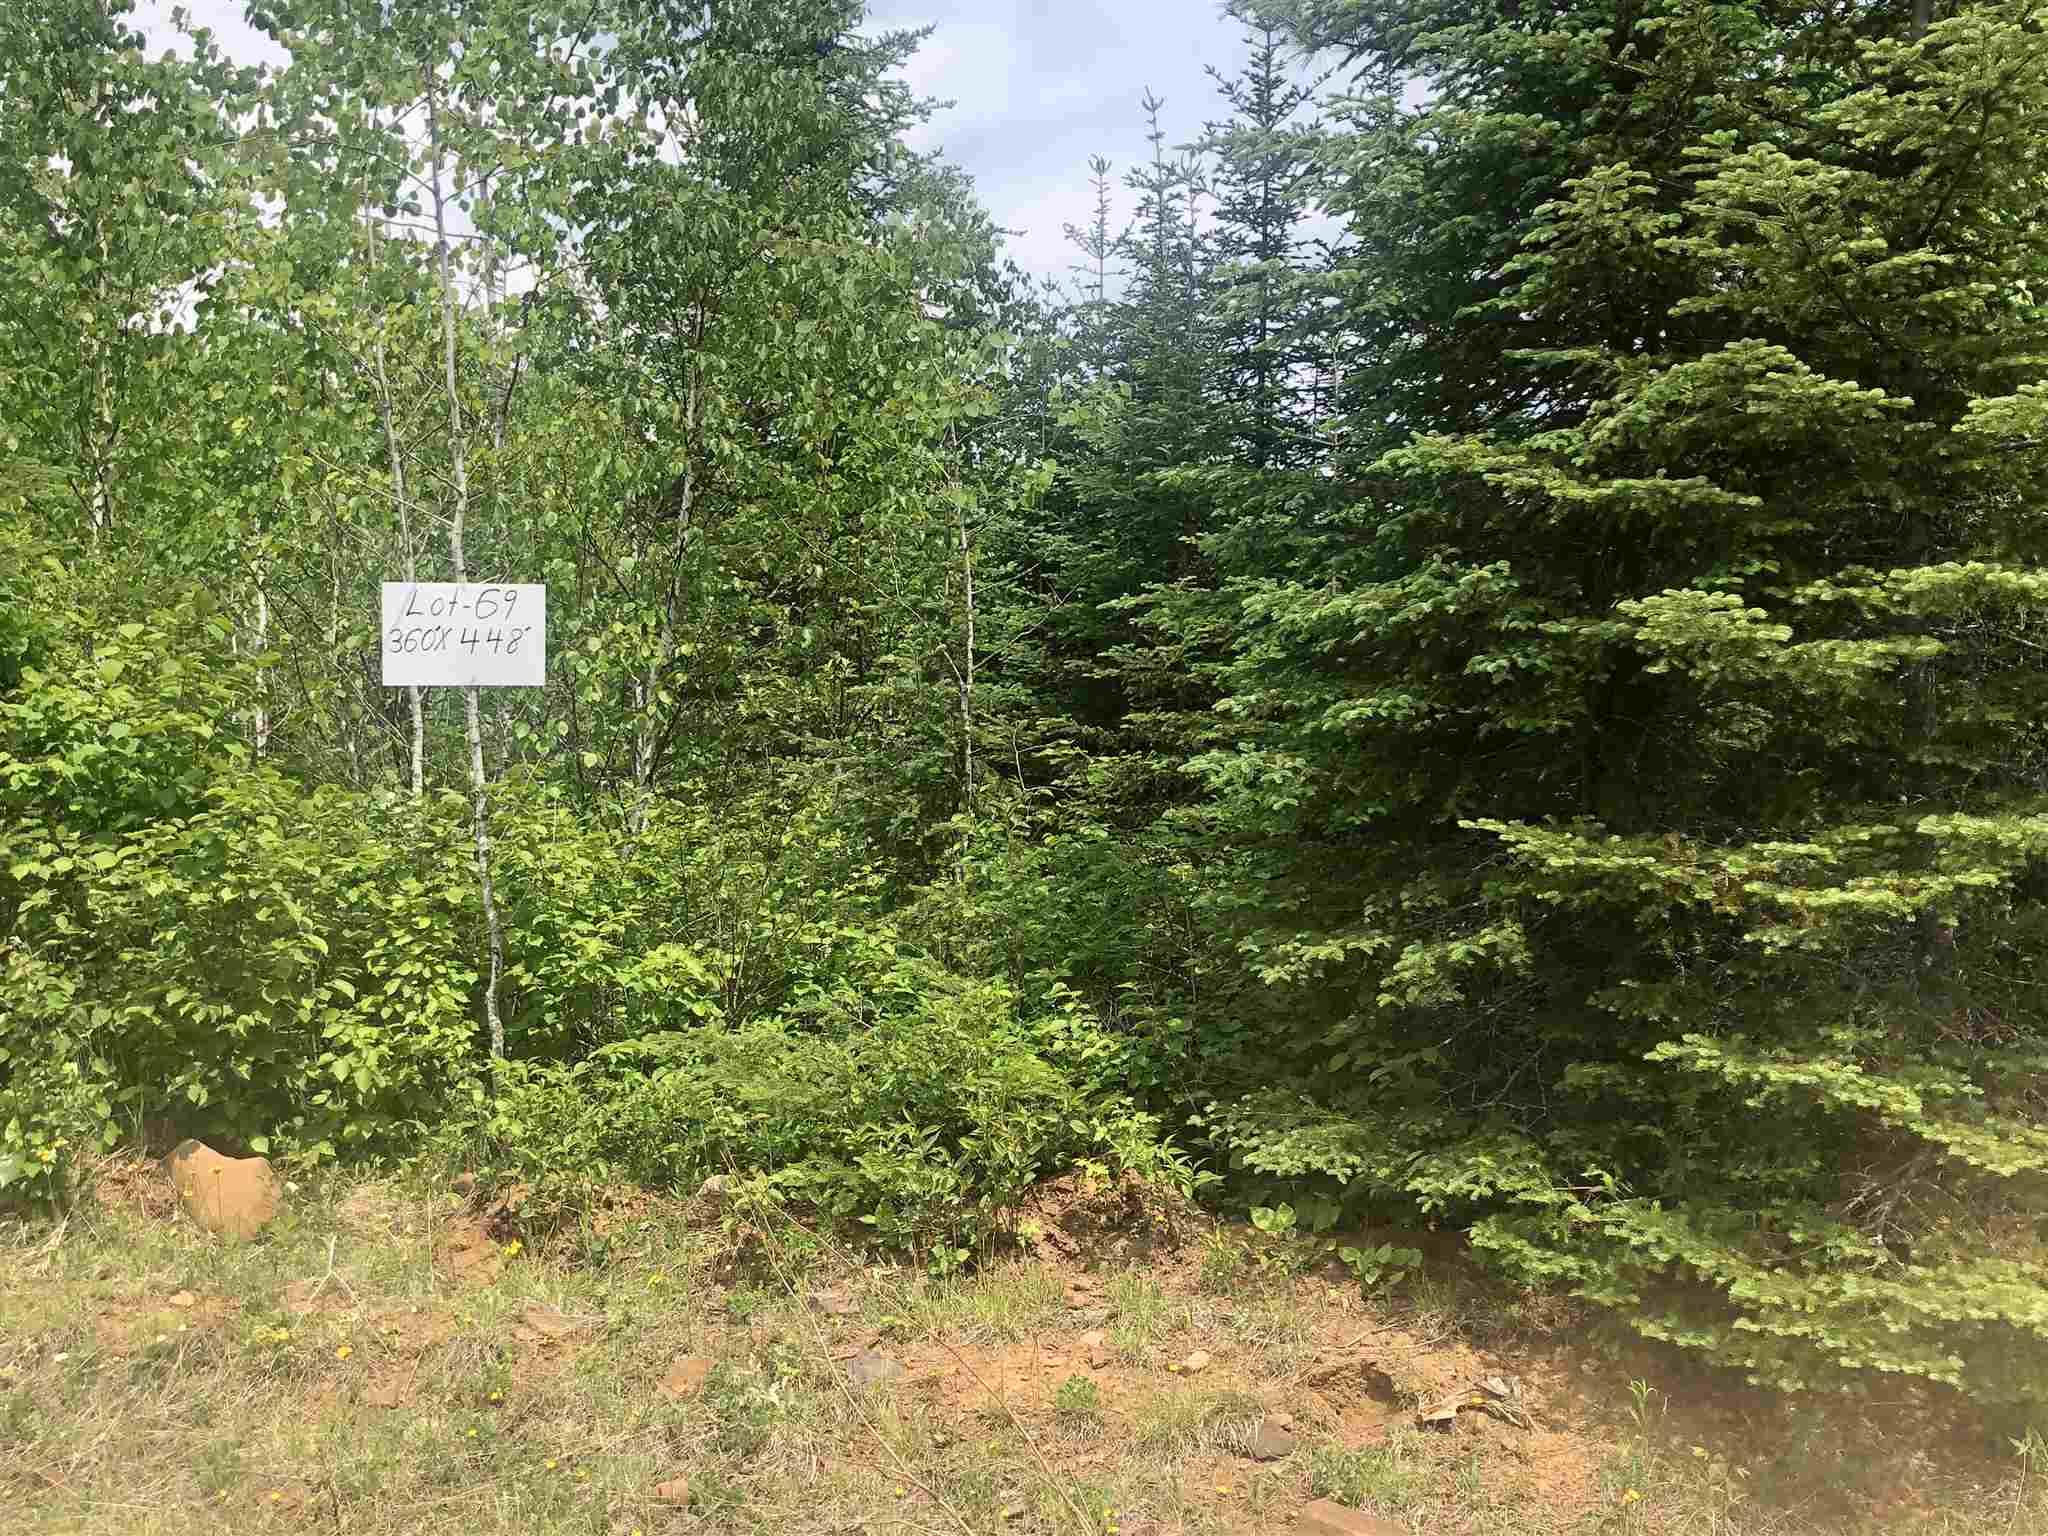 Lot 69 Red Pine Way, Thunder Bay Ontario, Canada